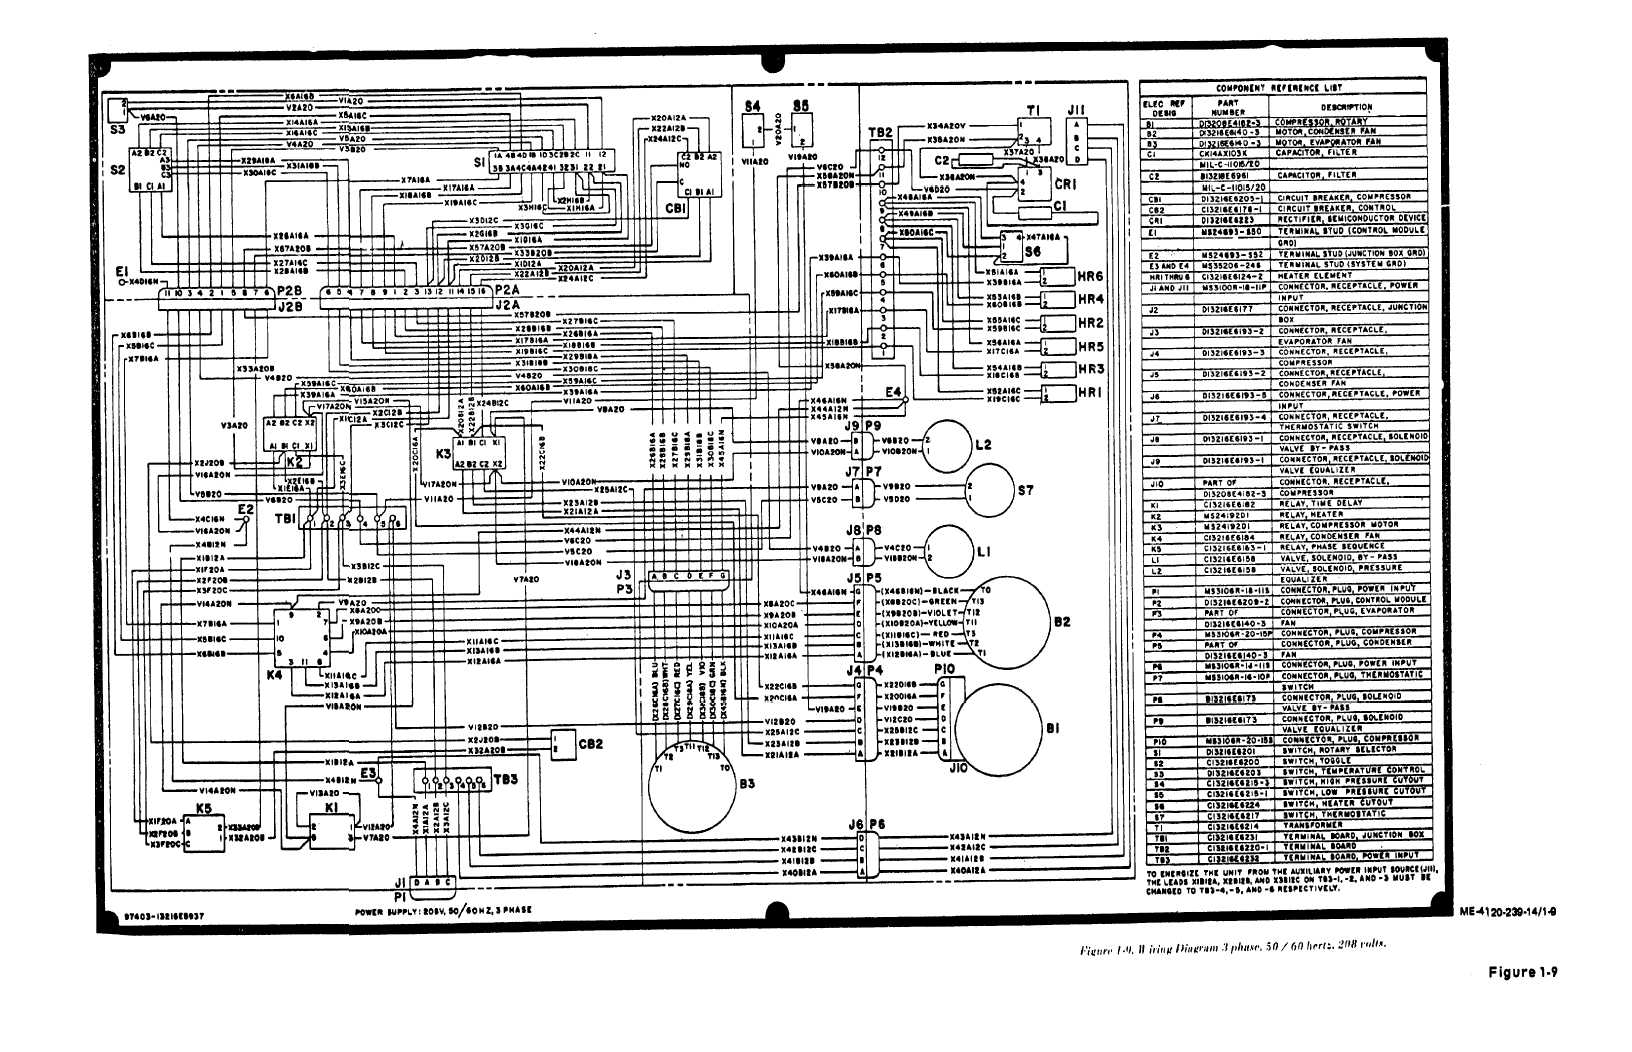 three phase wiring diagram motor bulldog security rs82 figure 1 9 3 50 60 hertz 208 volts